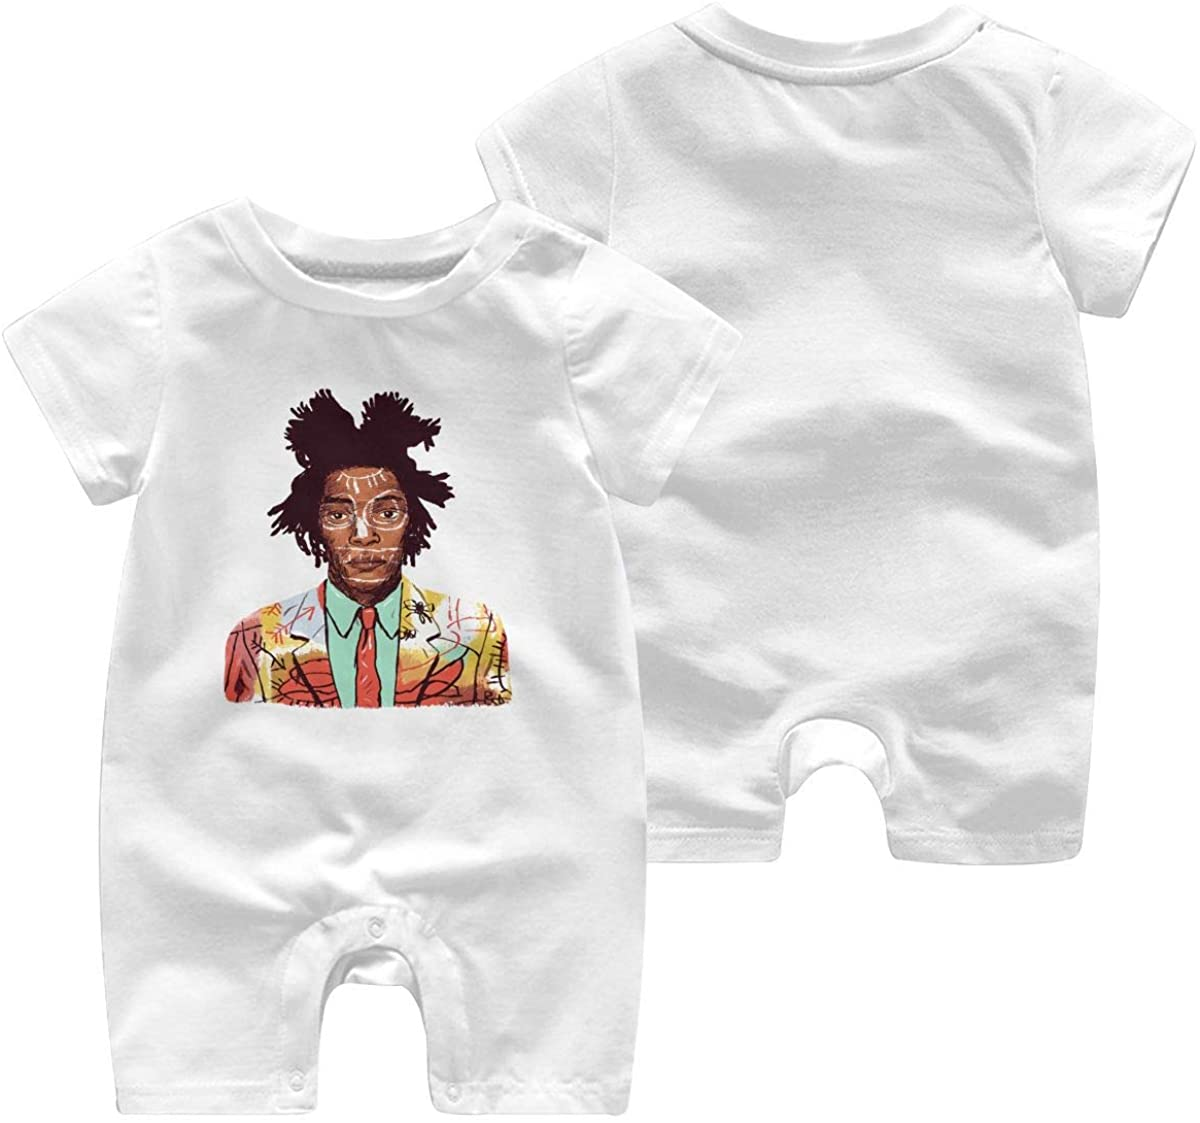 5husihai Jean Michel Basquiat 1-24 Months Boy Girl Baby Short Sleeve Creeper Jumpsuit White